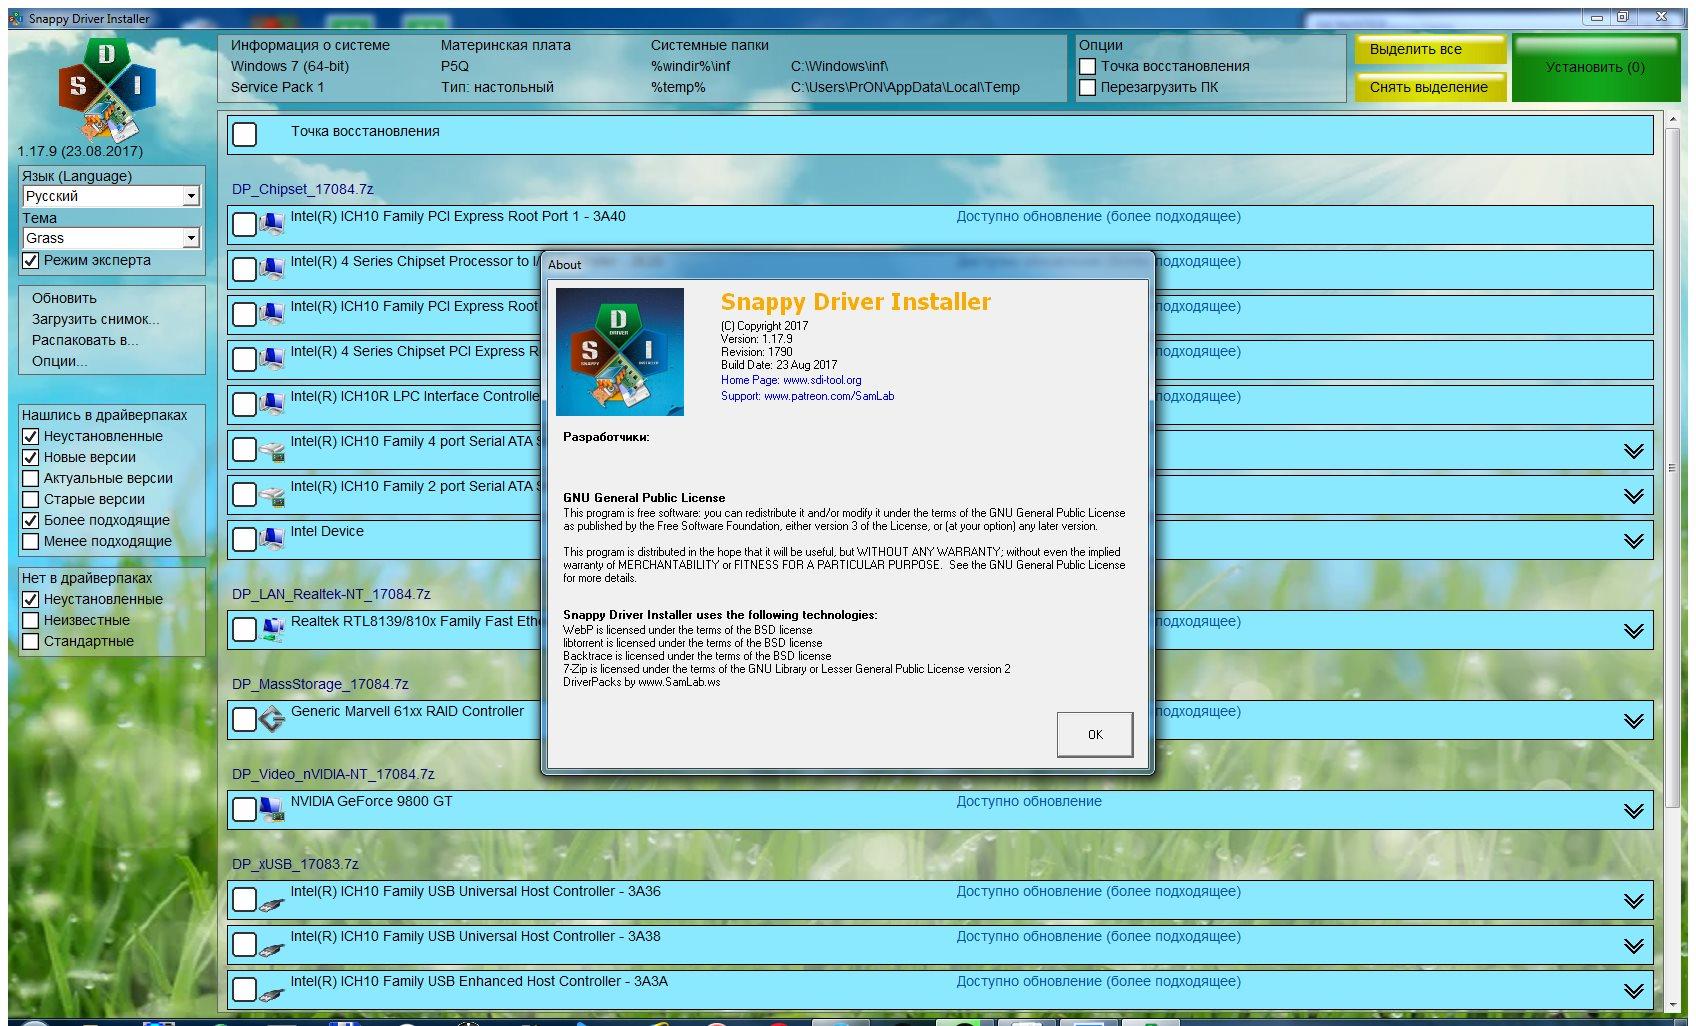 Snappy Driver Installer R1806